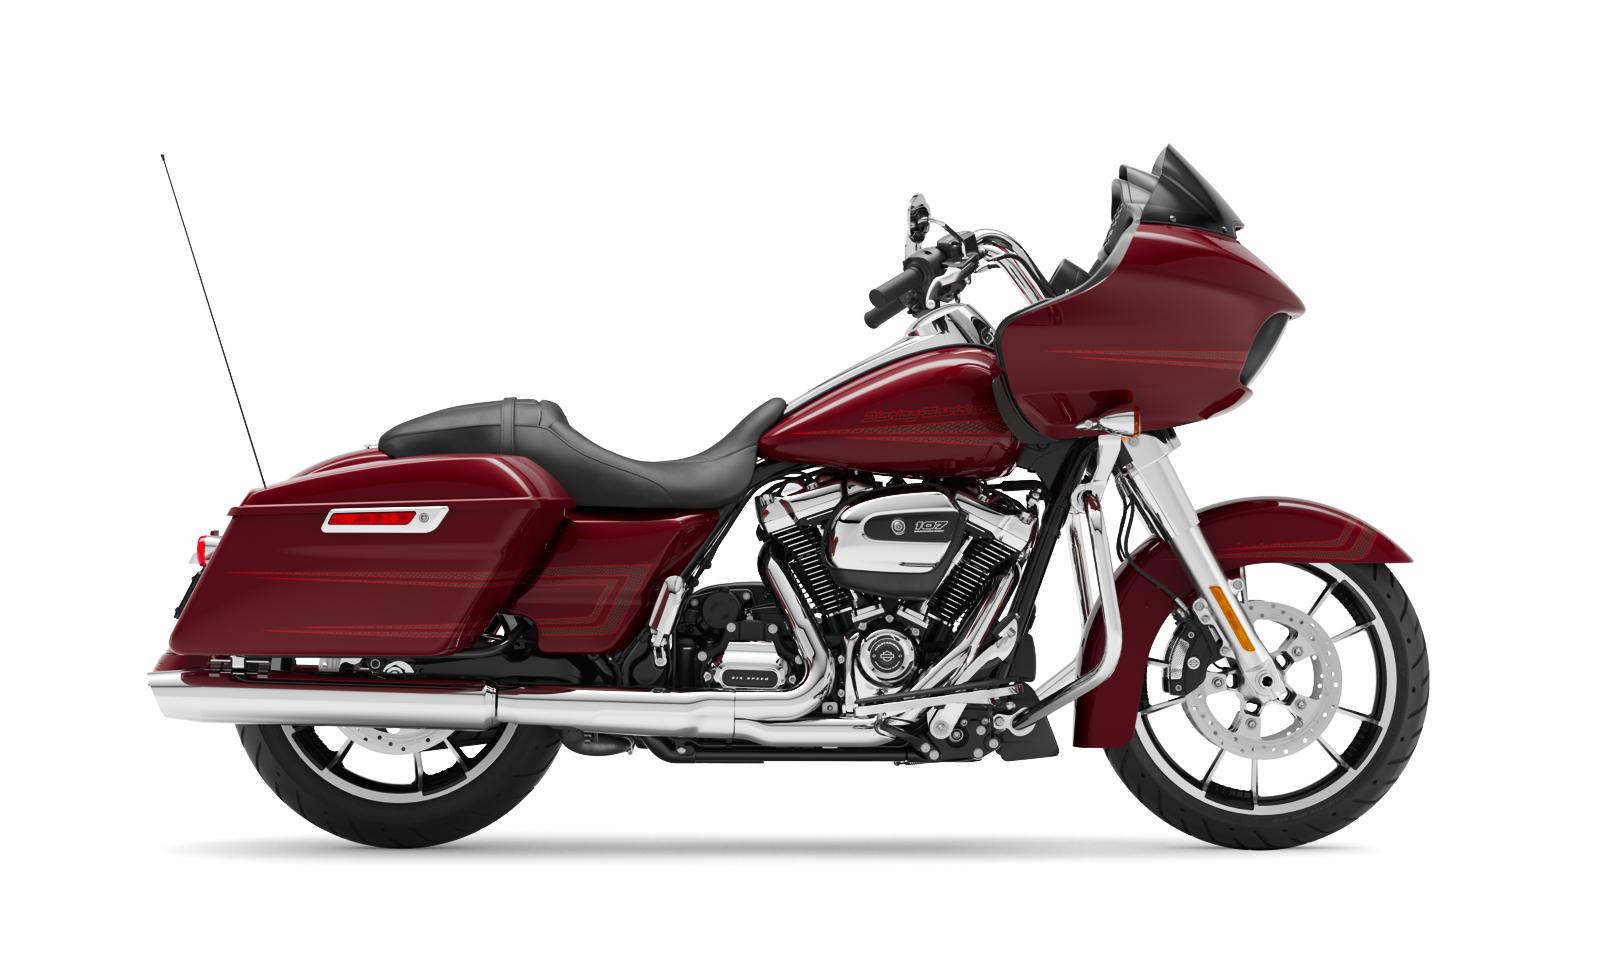 Harley Davidson Road Glide For Sale Near Me Off 51 Www Abrafiltros Org Br